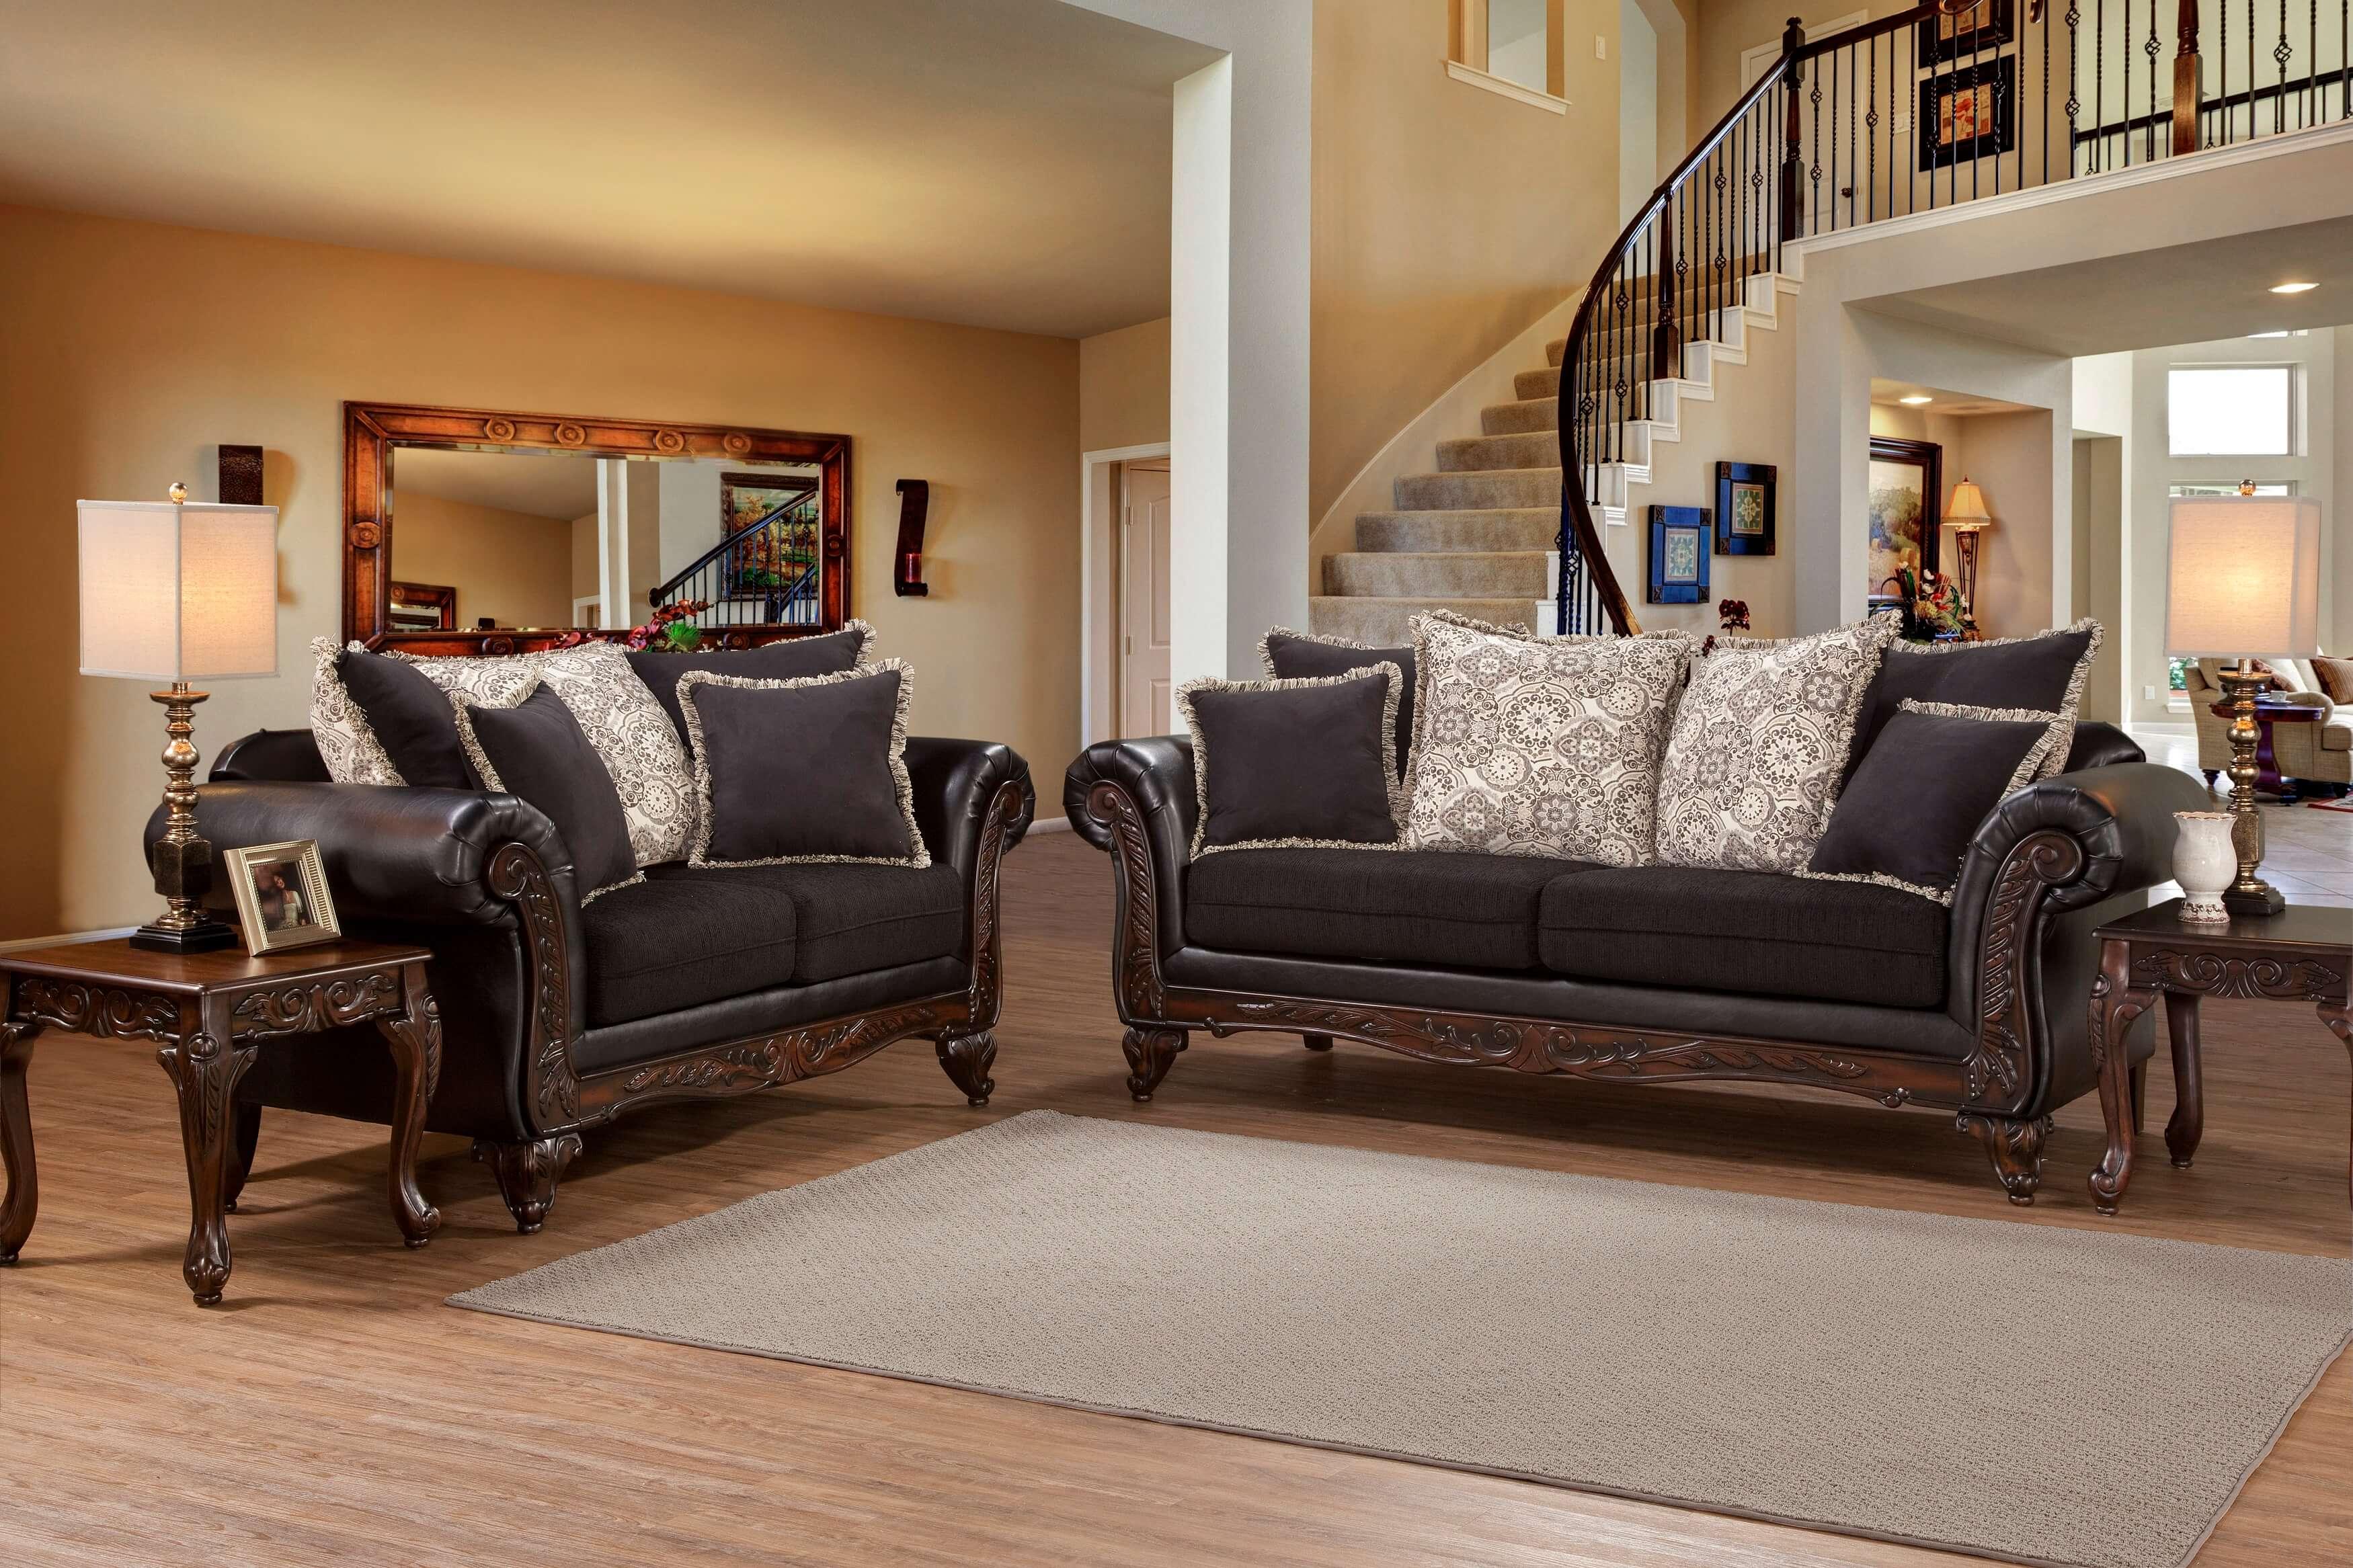 sienna sofa machine washable slipcovered sofas serta soprano ebony and loveseat living room sets